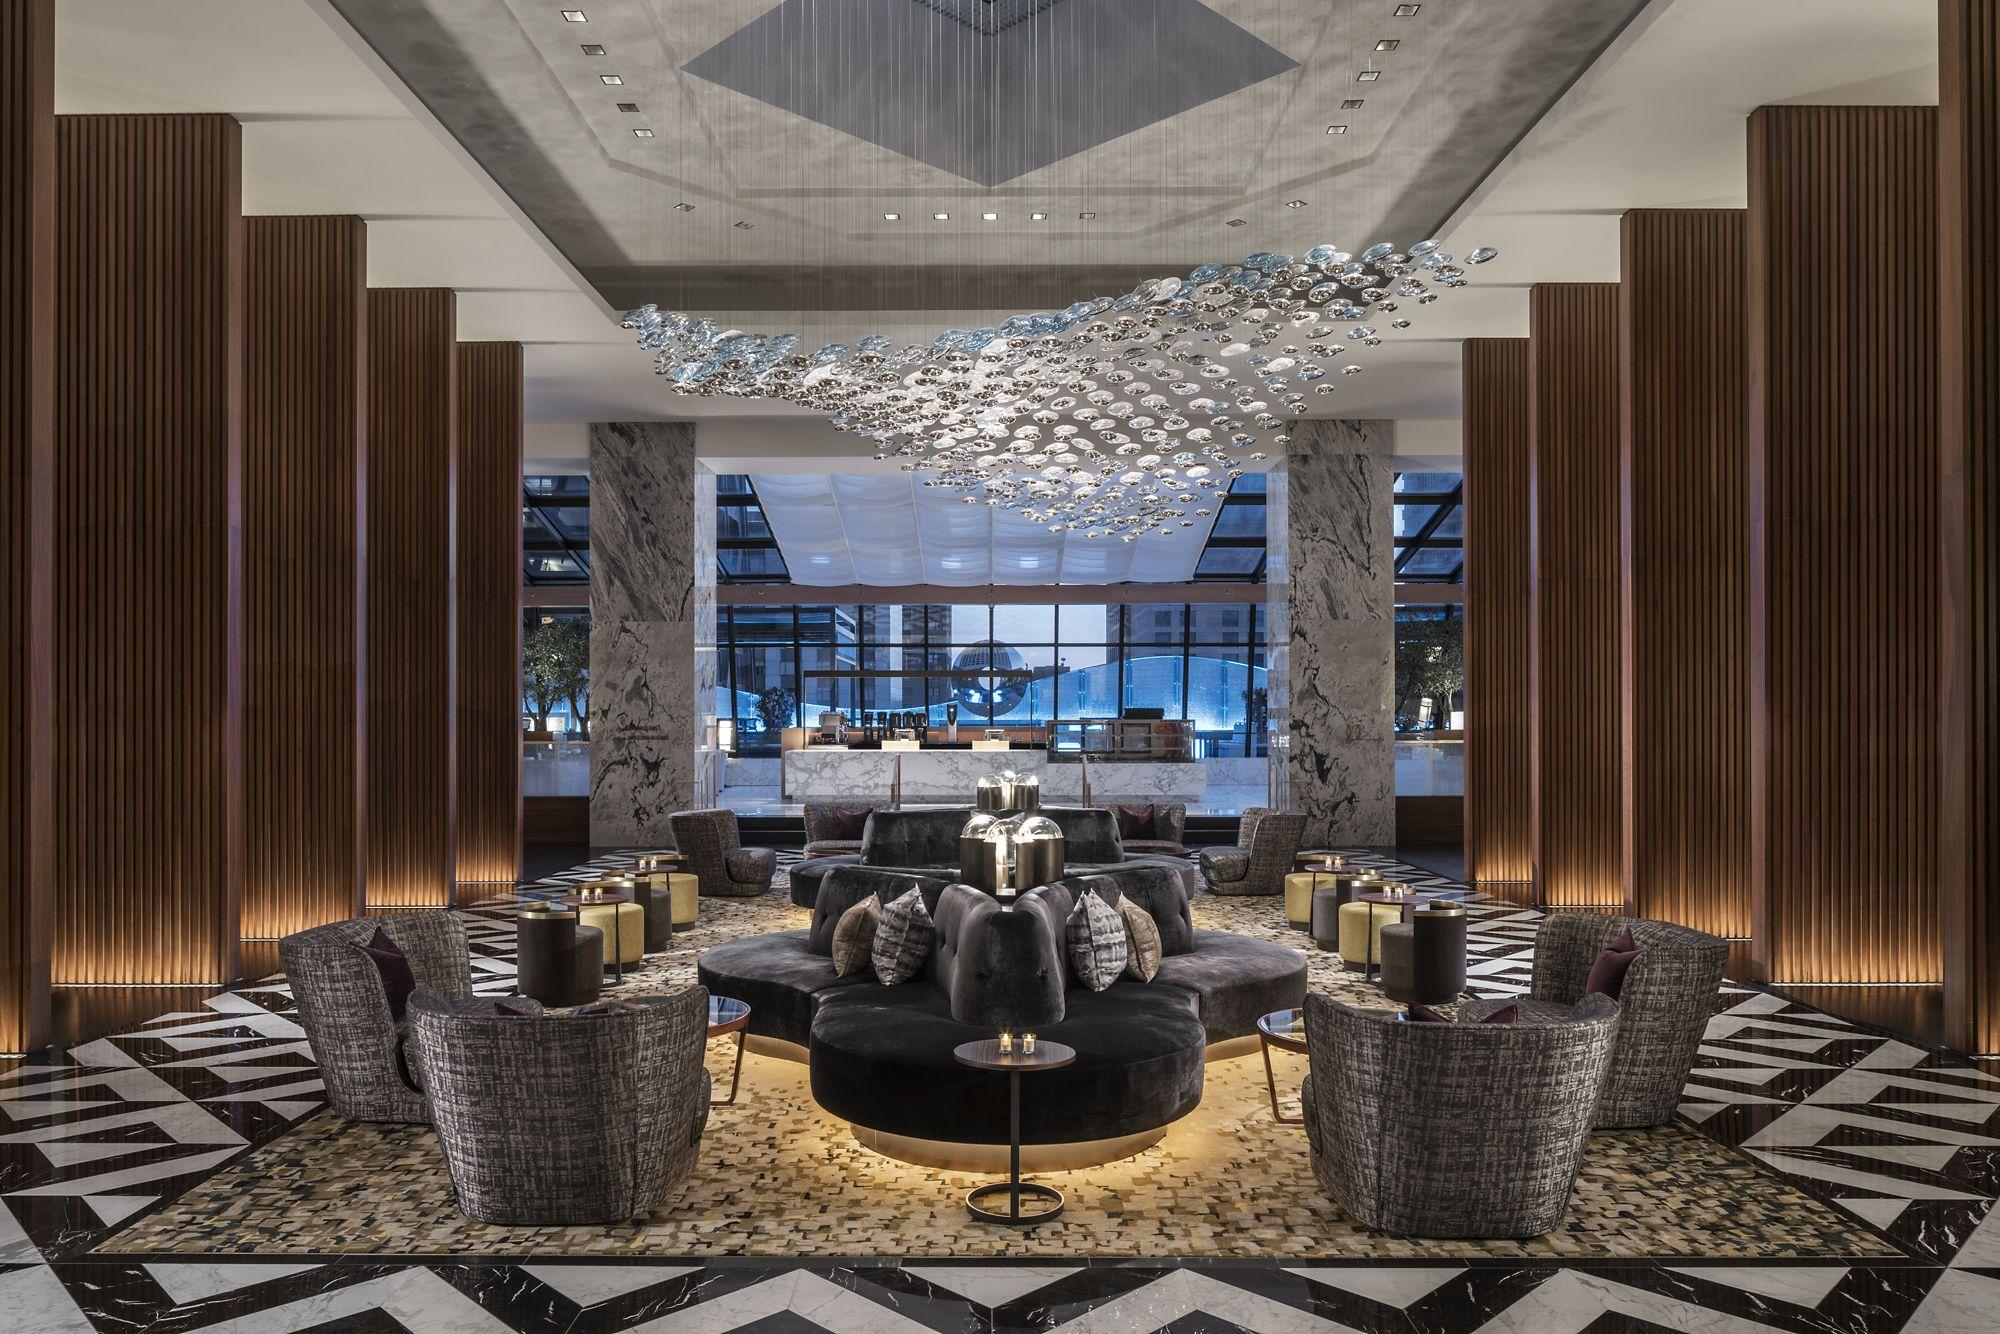 The Ritz-Carlton, Chicago image 9